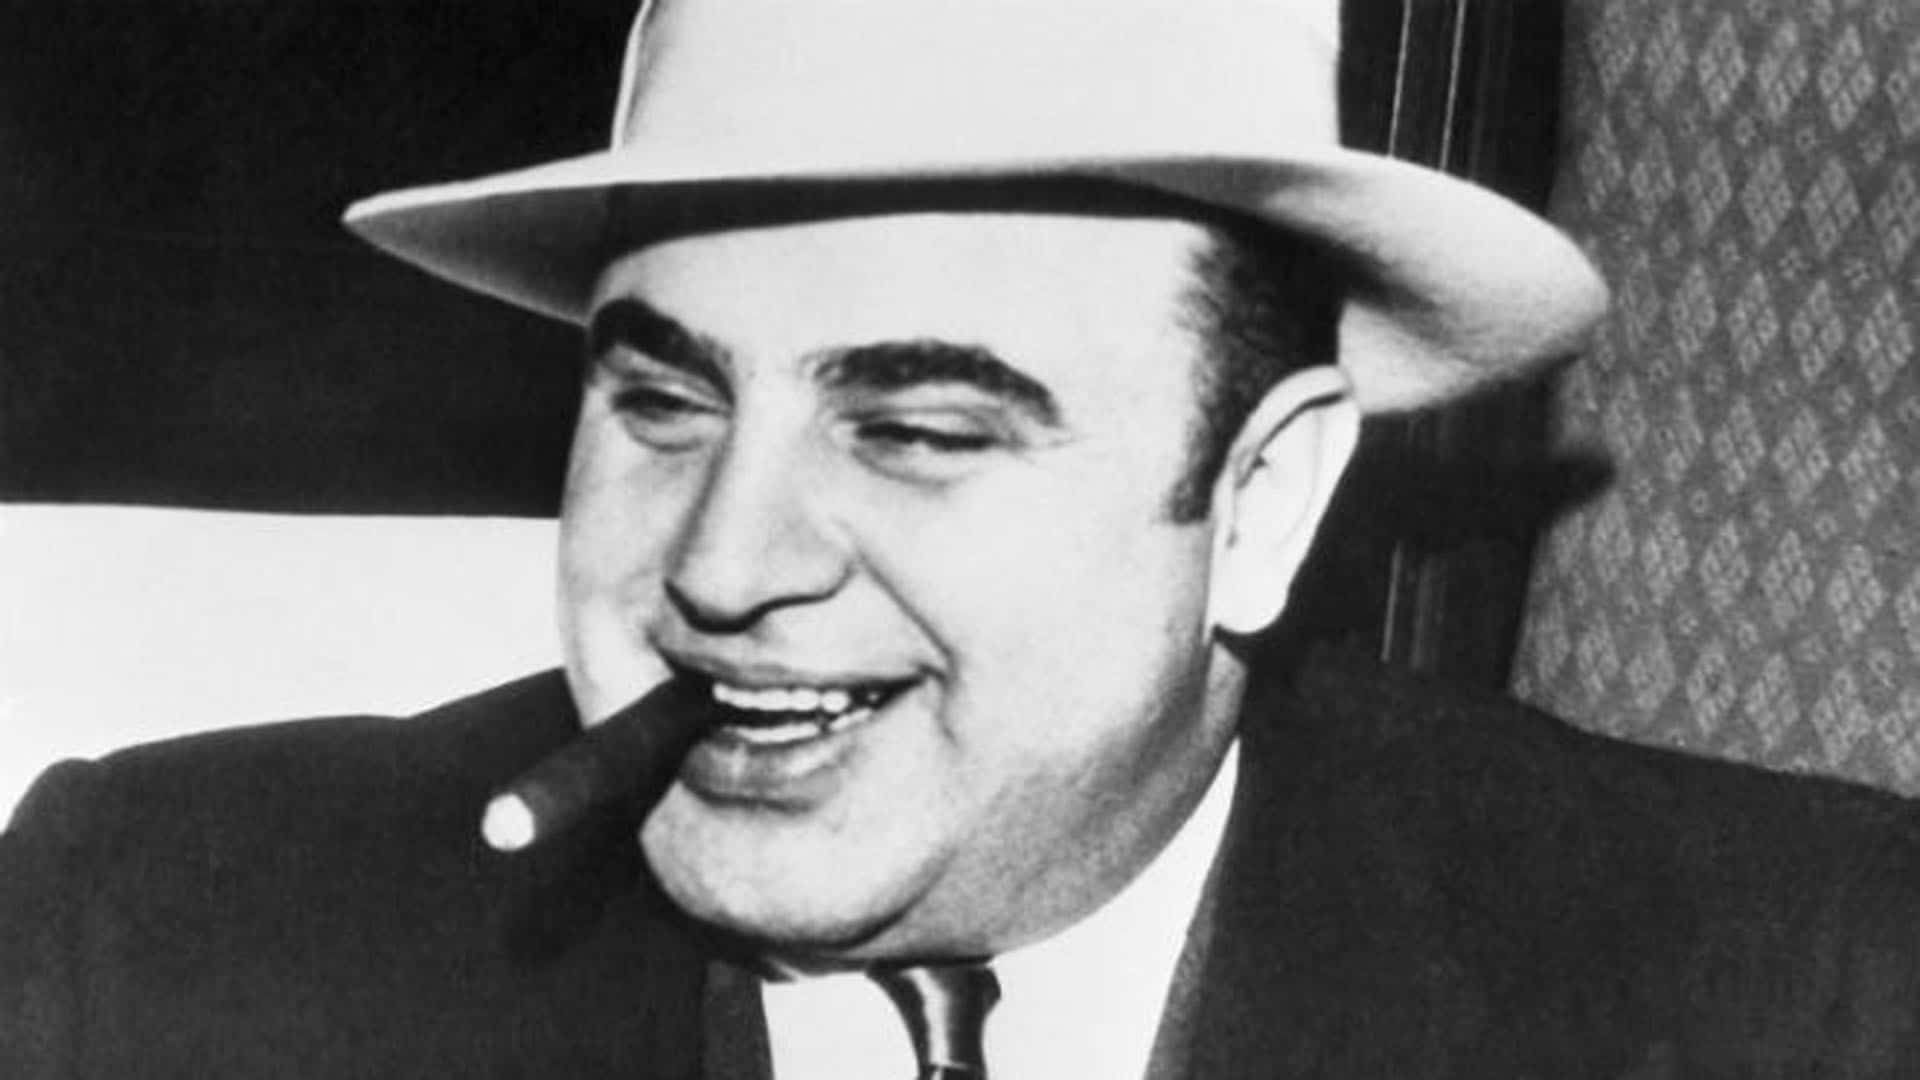 Al Capone gangster